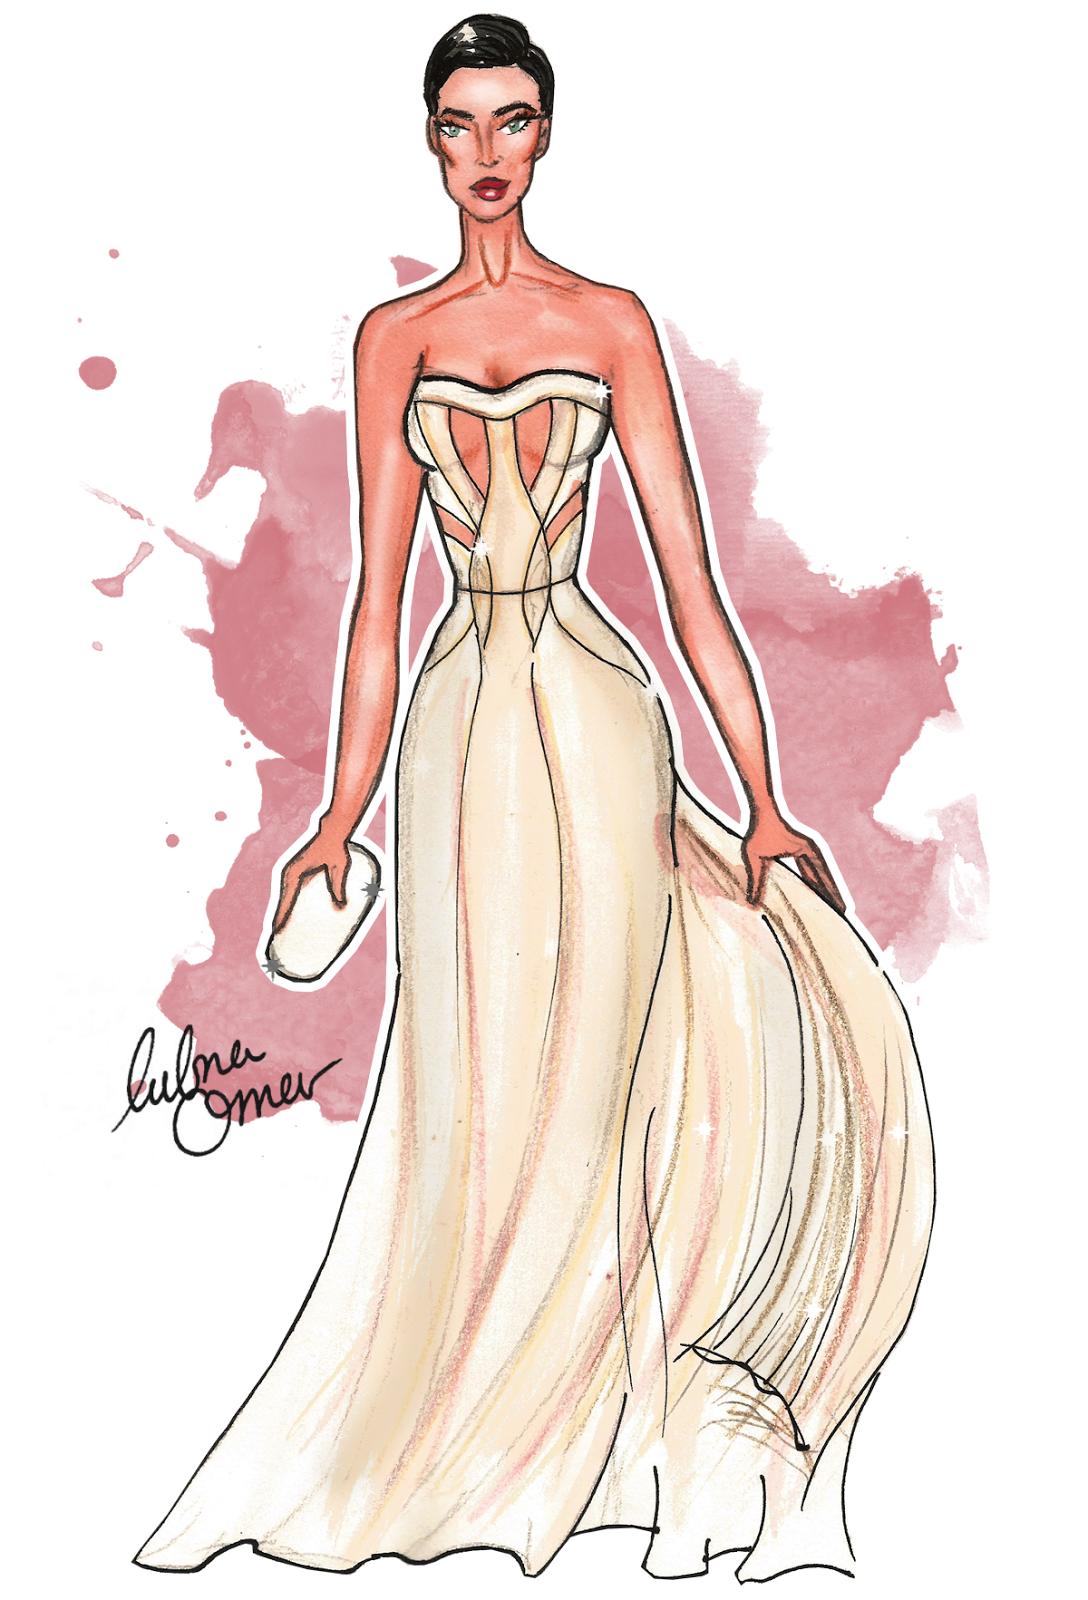 Irina Shayk in Atelier Versace illustration by Lubna Omar